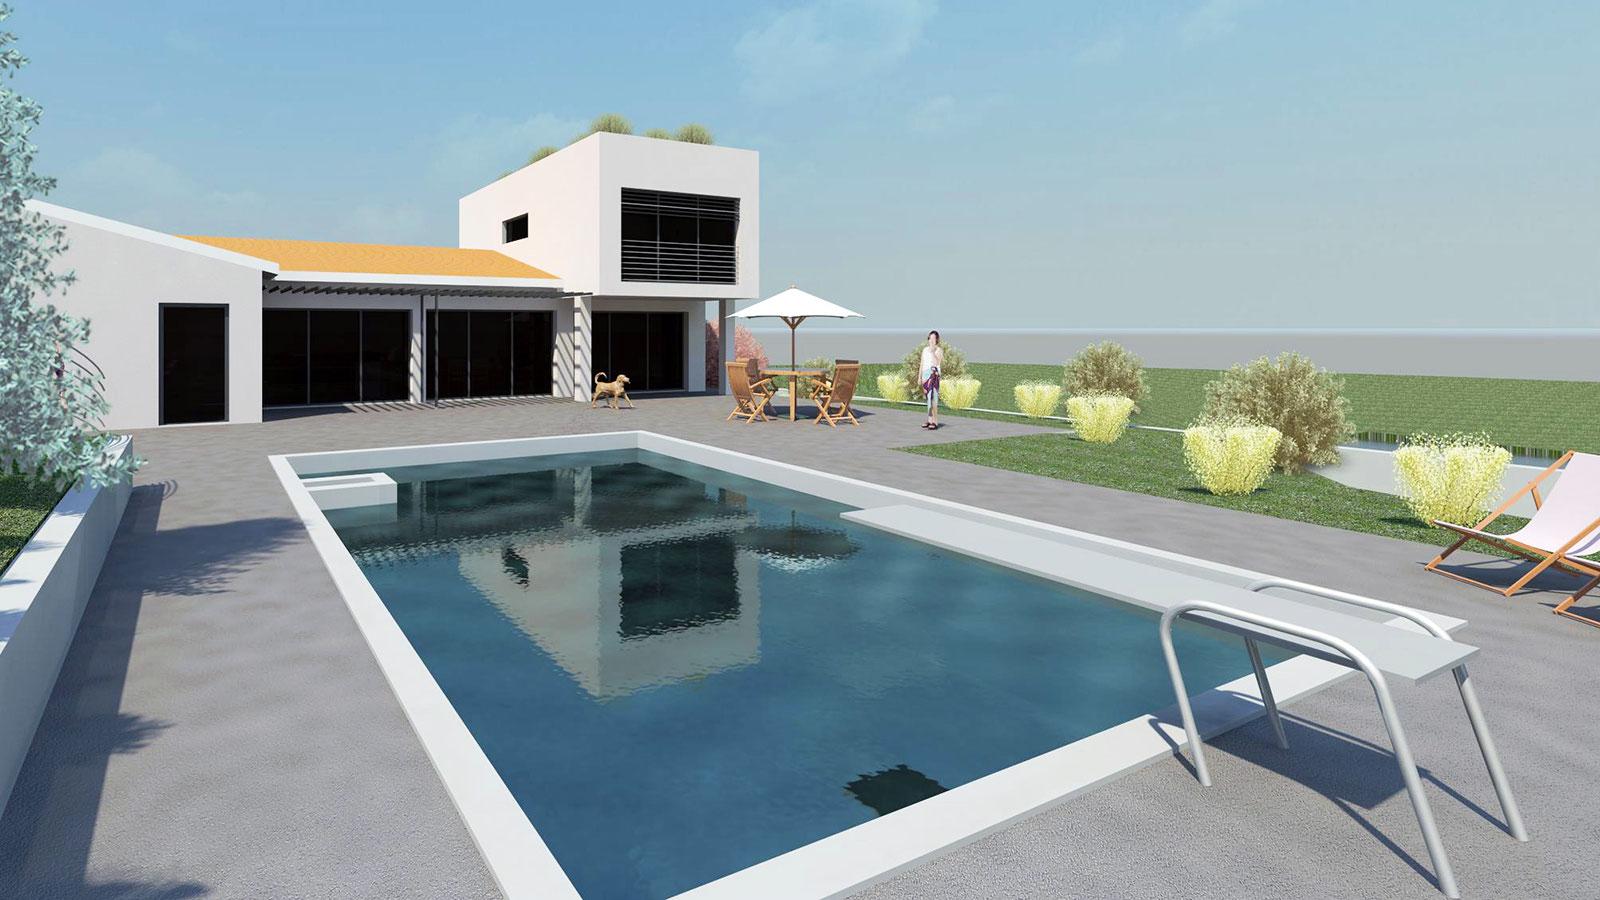 maison bo agence epure guillaume cariou architecte libourne architecture et maitrise d 39 oeuvre. Black Bedroom Furniture Sets. Home Design Ideas